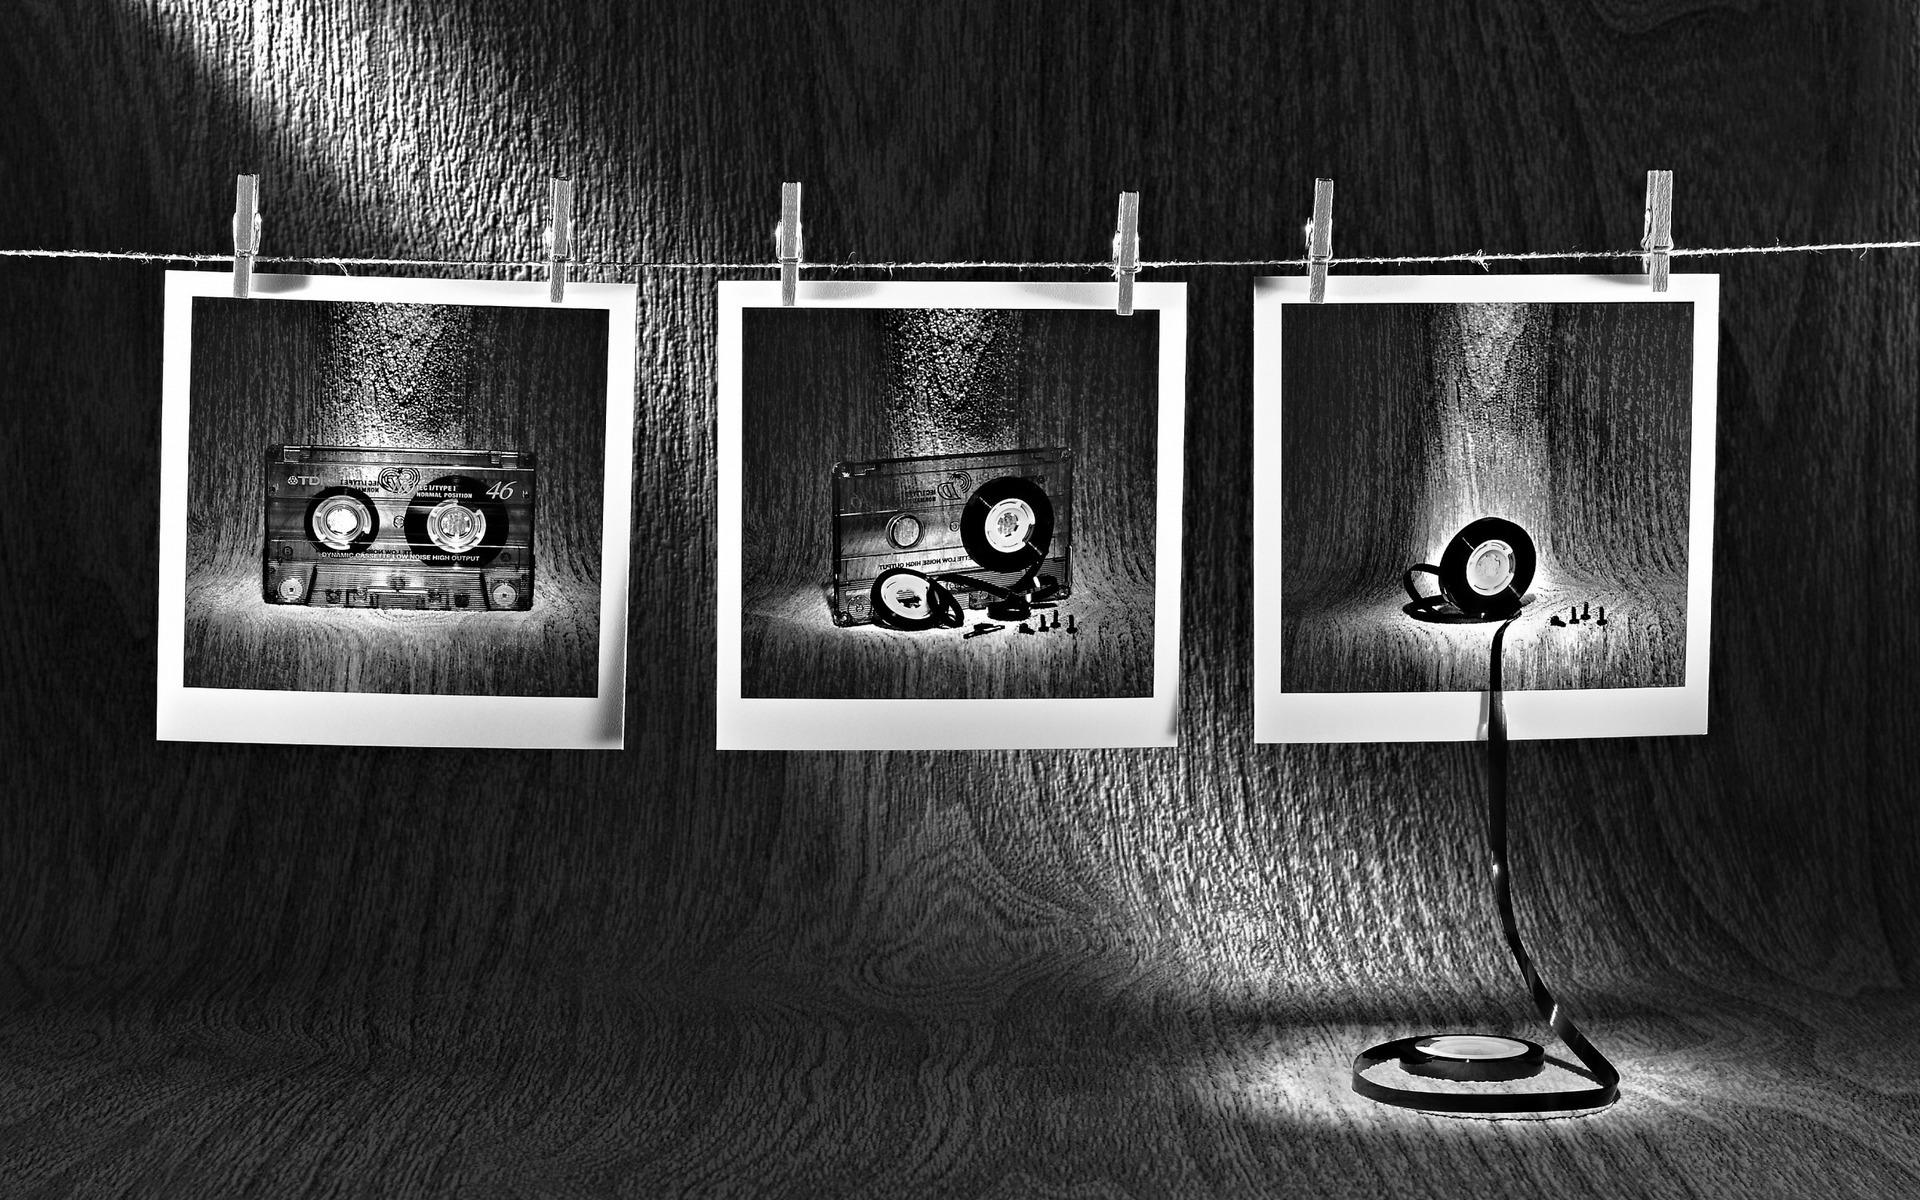 Bureau Noir Et Blanc blacksheep: selection of the week #6 – lo-fi stereo